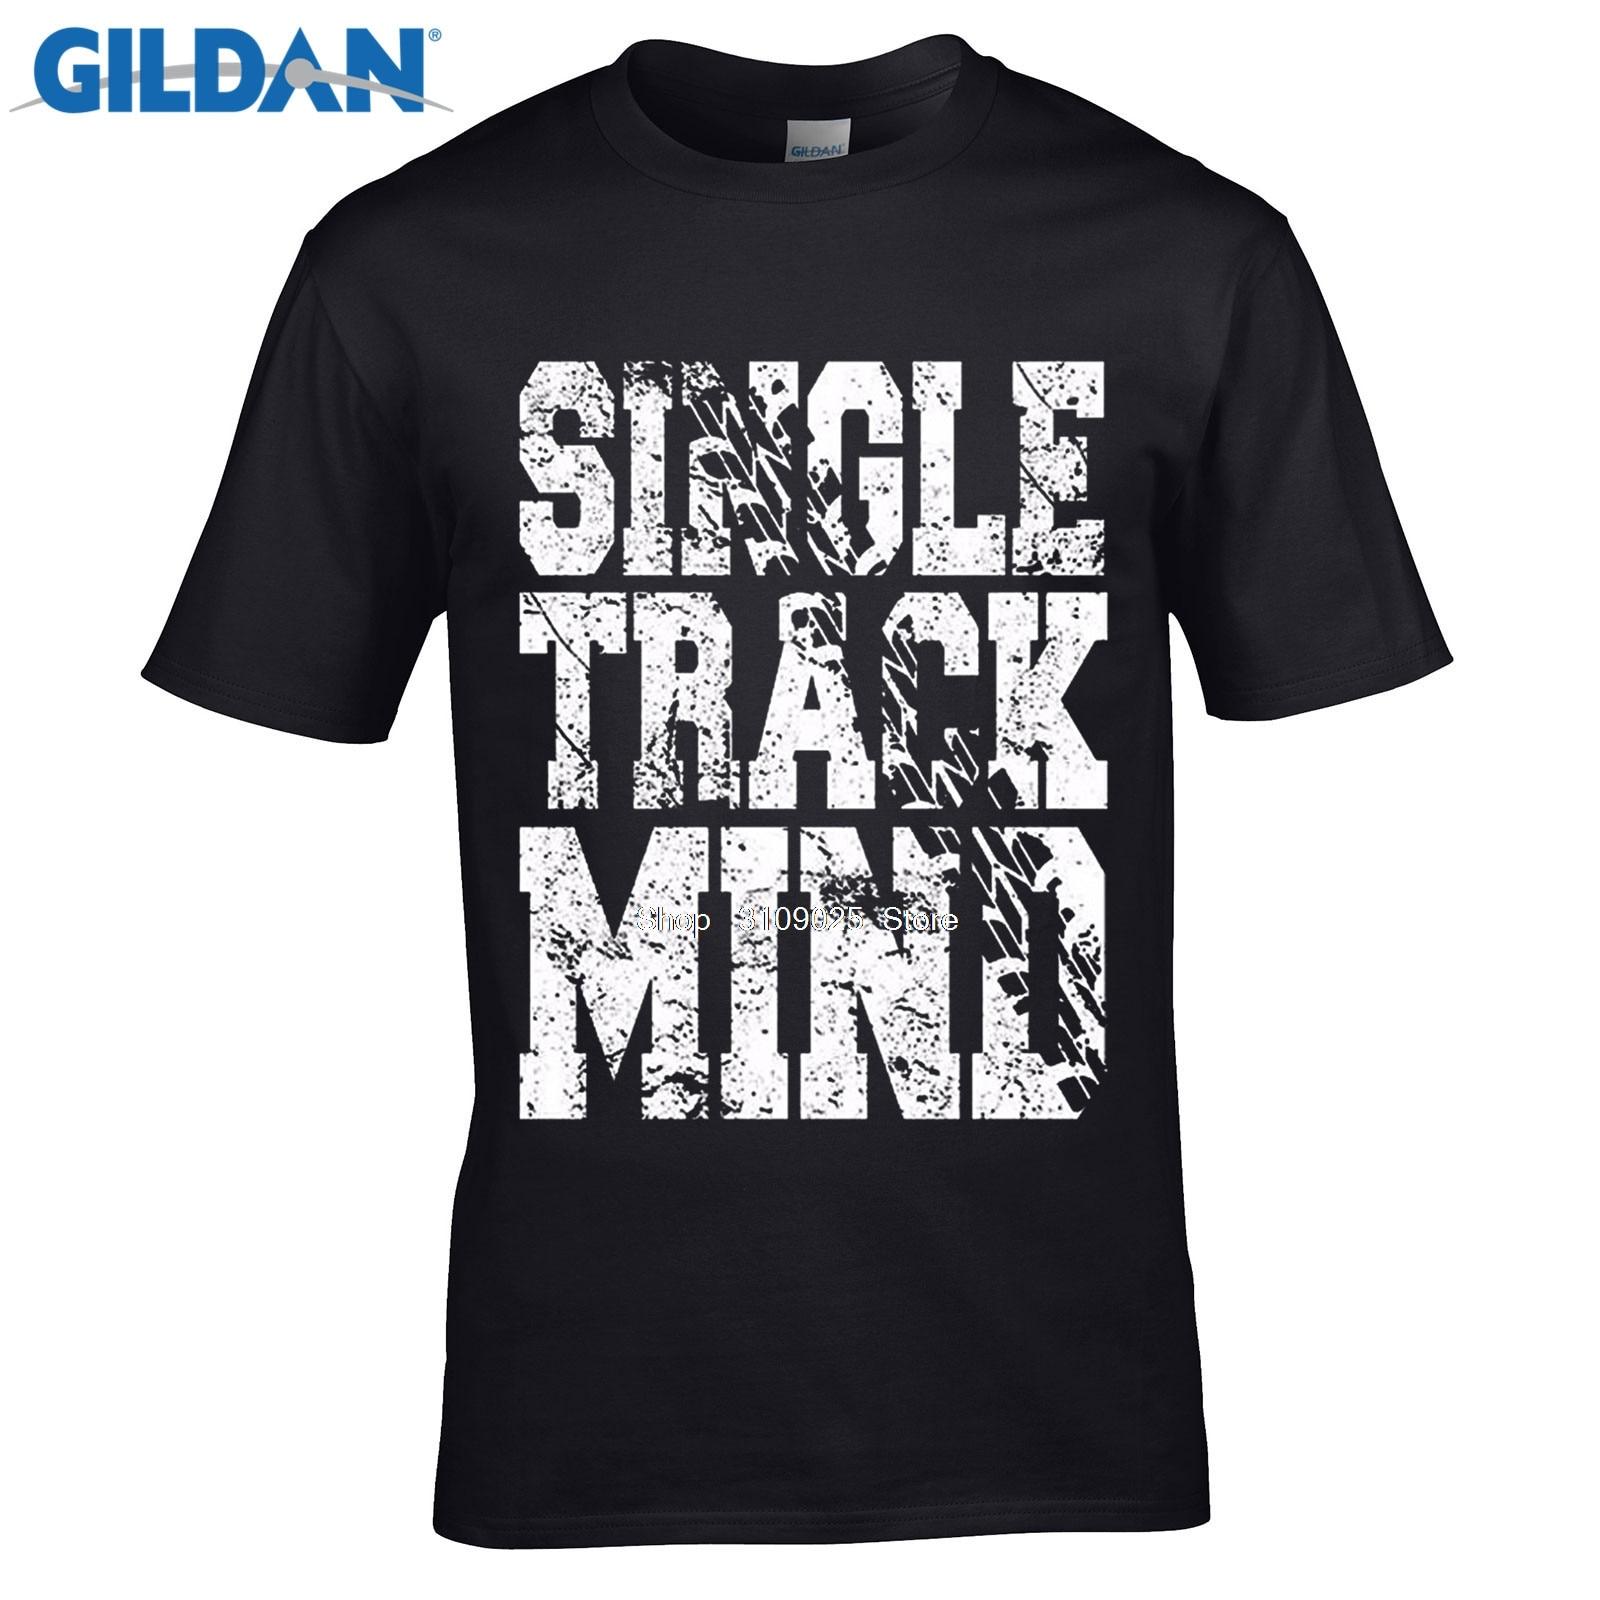 Design t shirt gildan - Gildan Designer T Shirt Summer Fashion Summer Style Fitness Brand Men S Single Track Mind Mountain Biking T Shirto Neck Tshirt